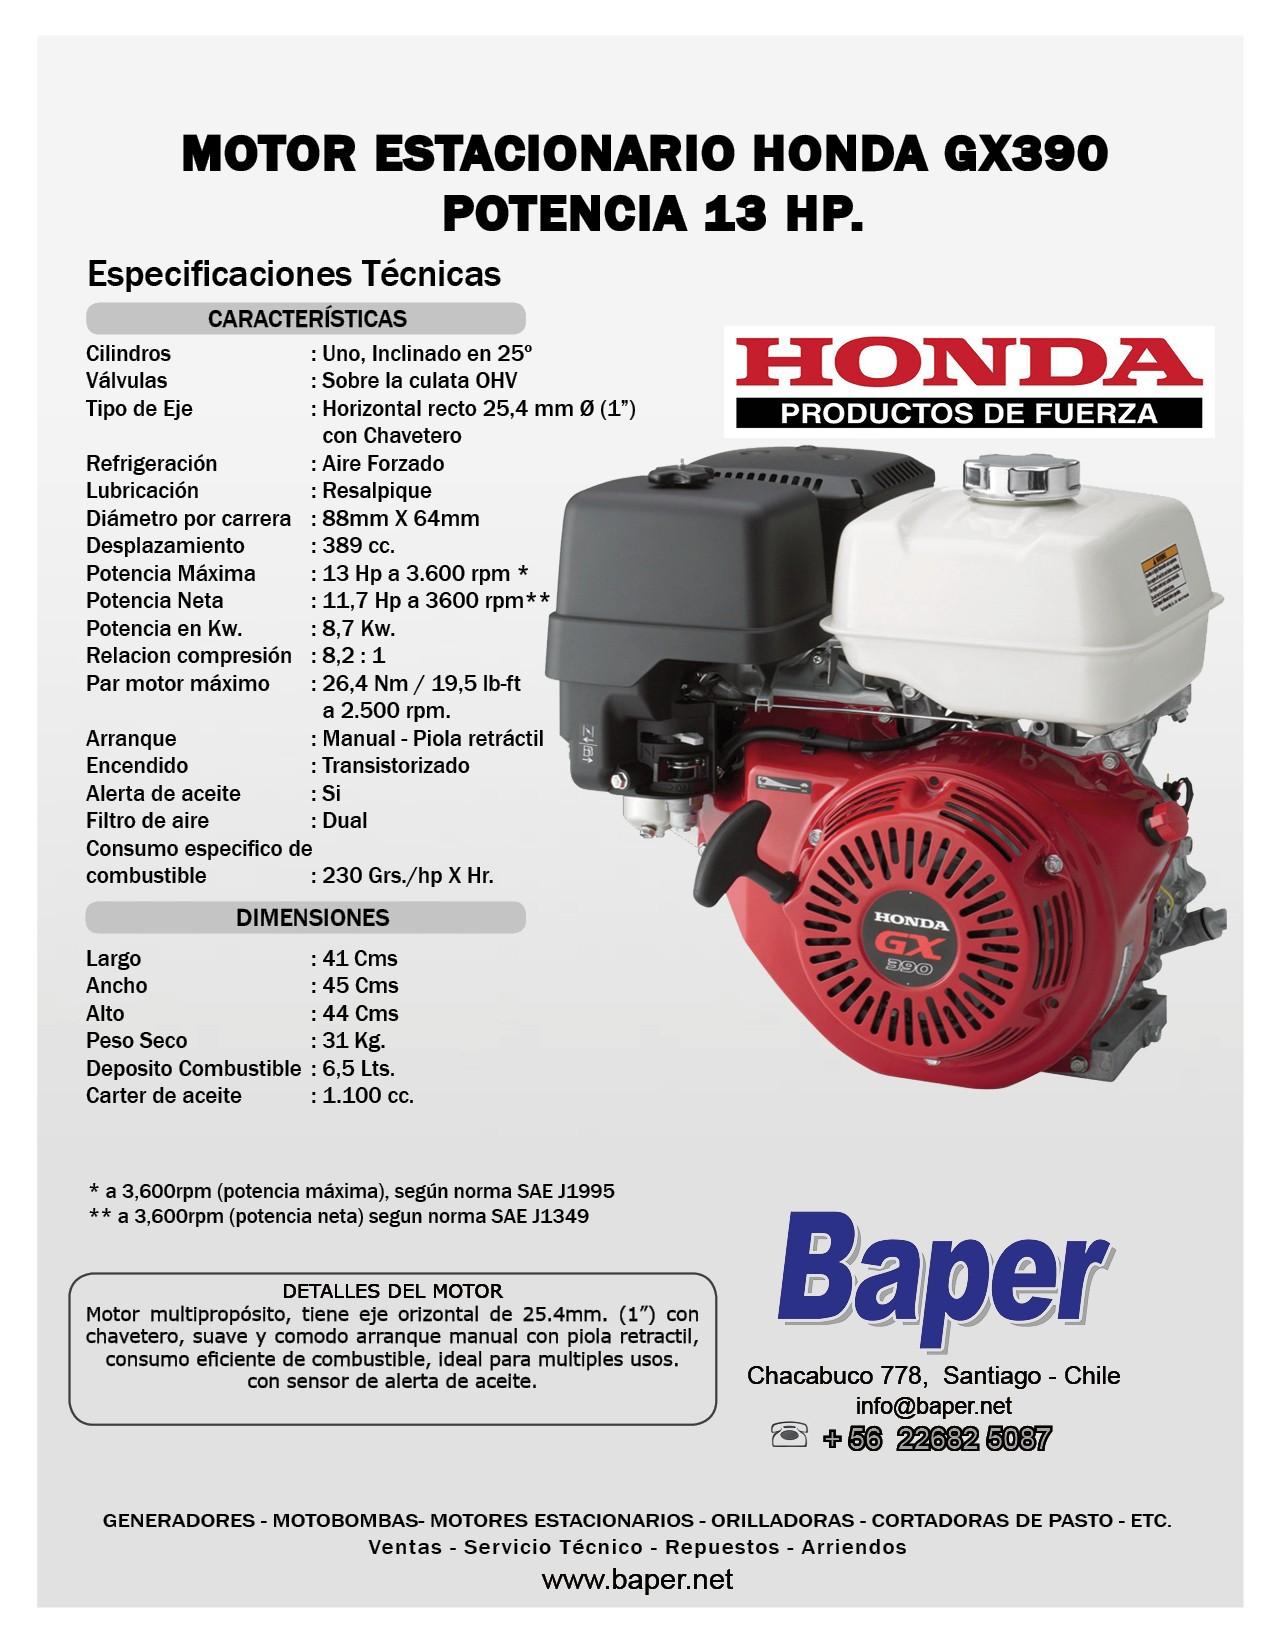 hight resolution of honda gx390 parts diagram motor estacionario honda bencinero gx390 13hp arranque manual baper of honda gx390